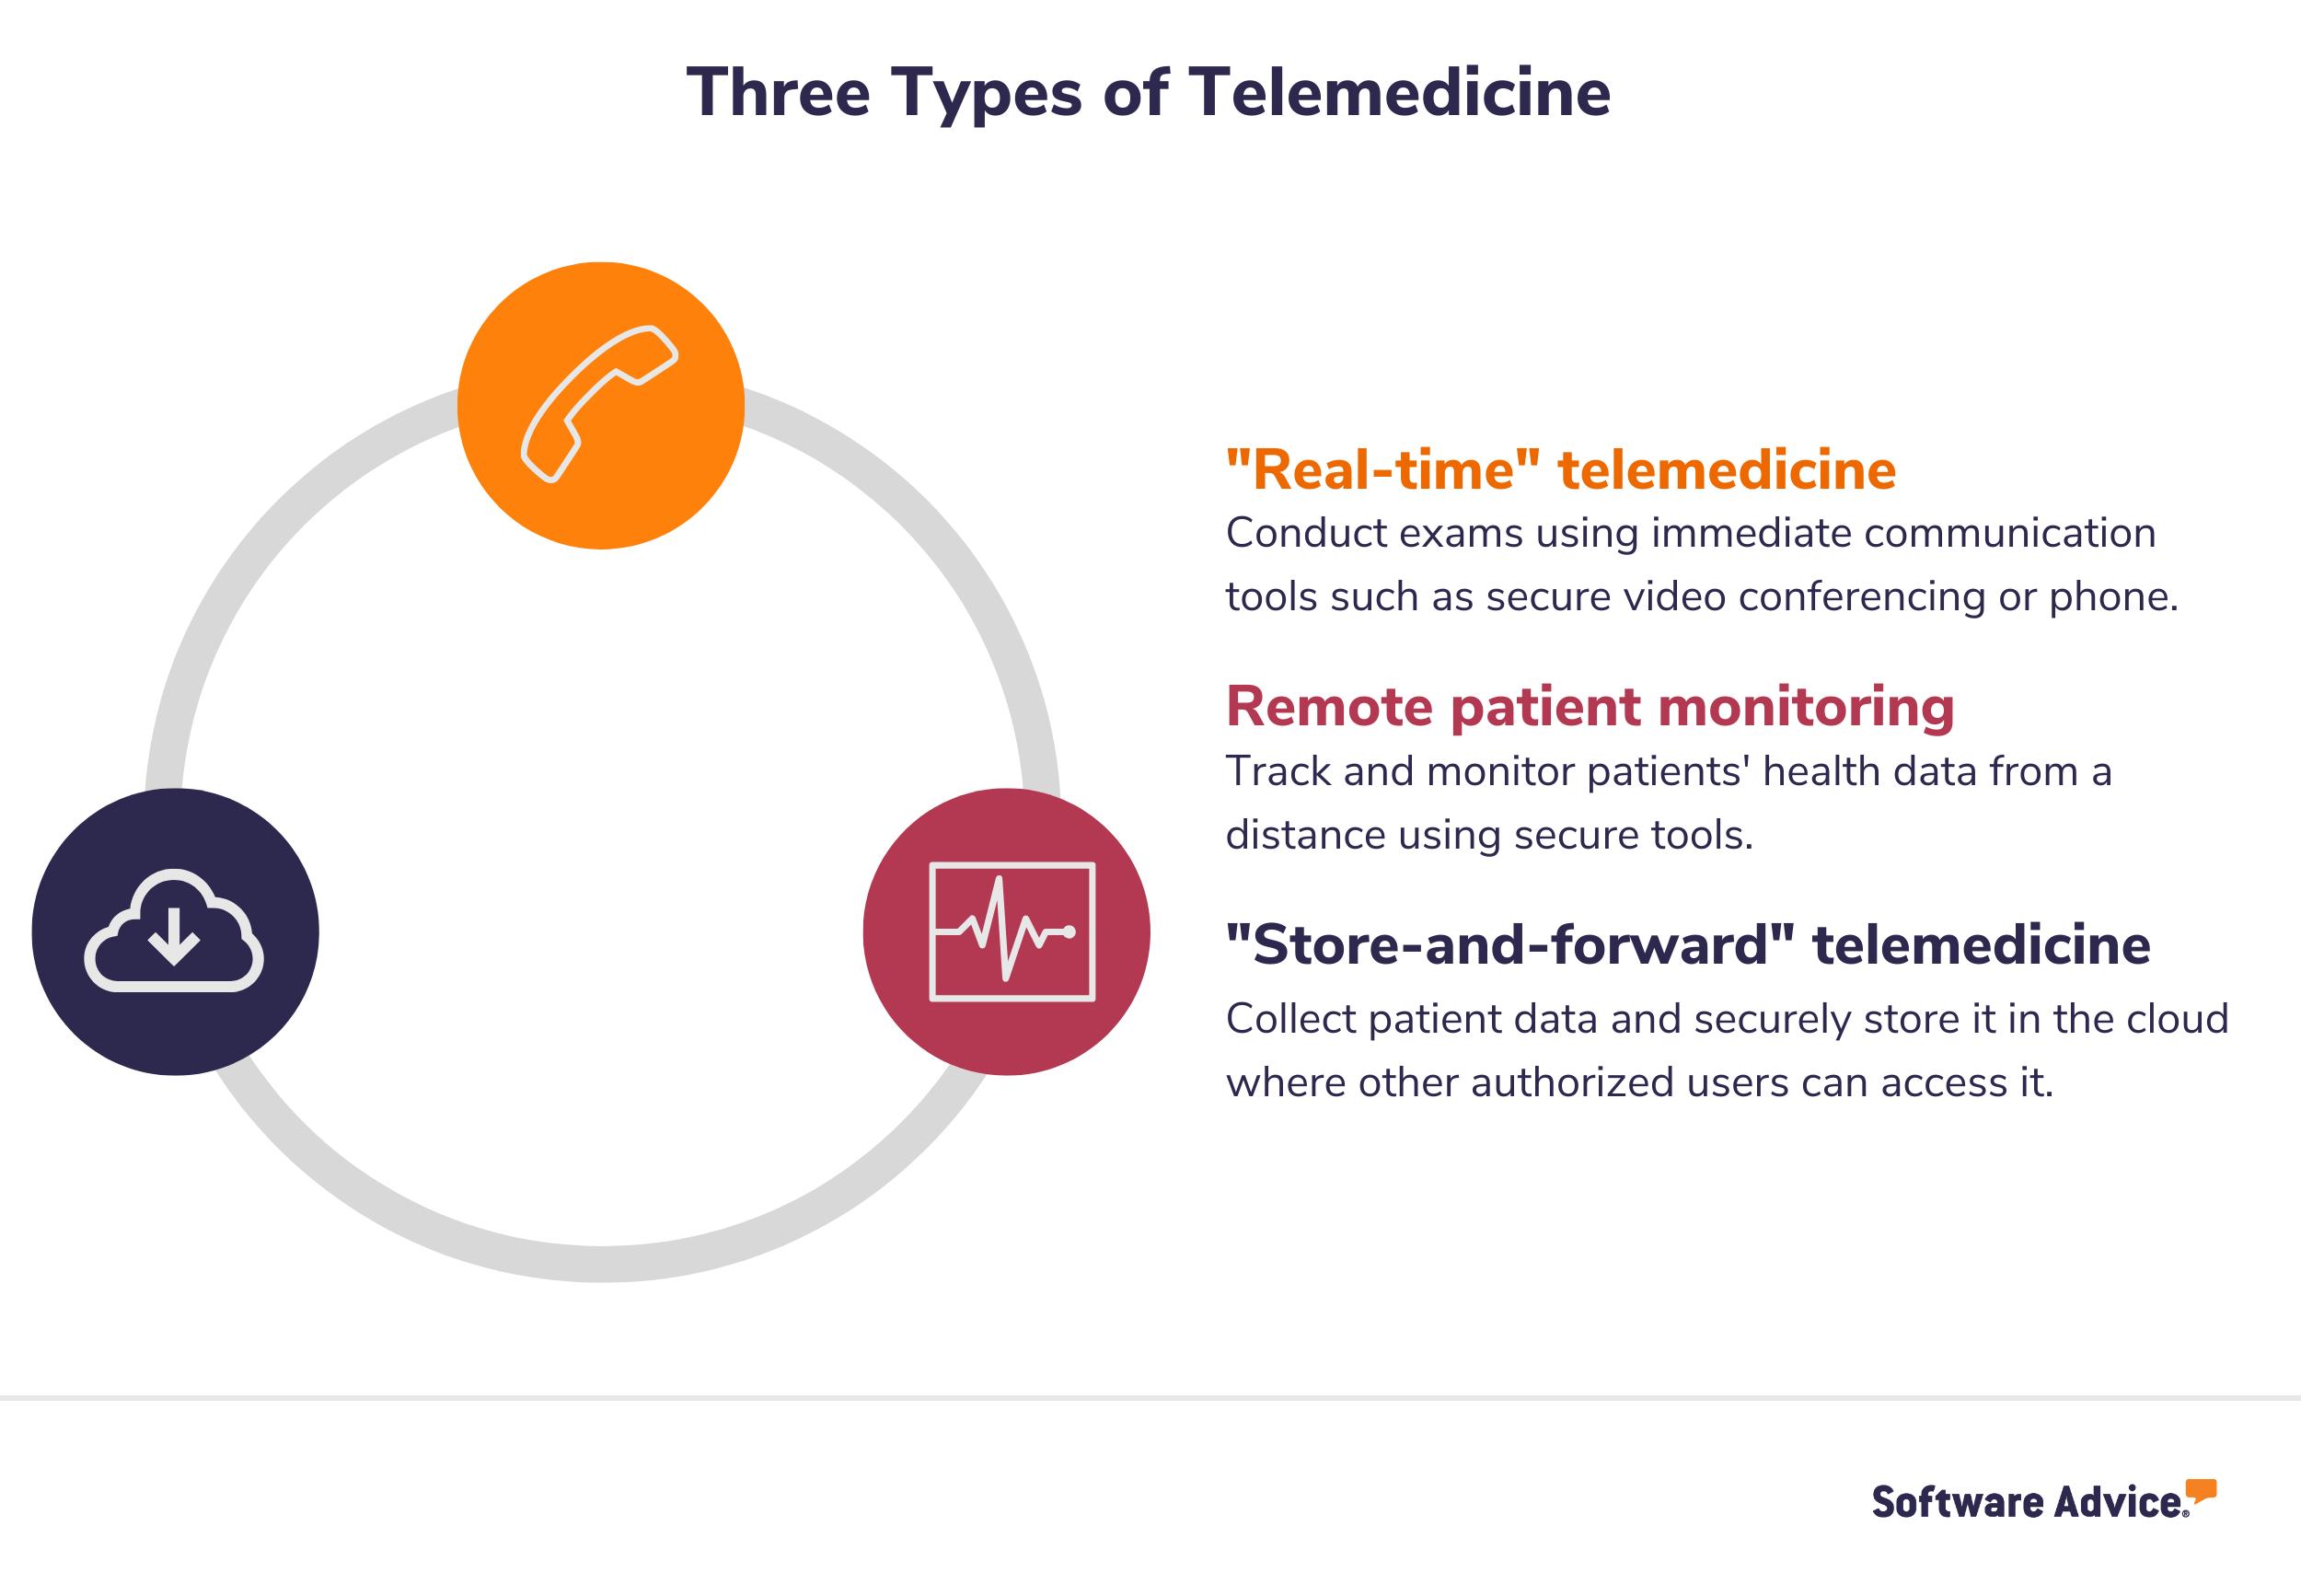 Three types of telemedicine